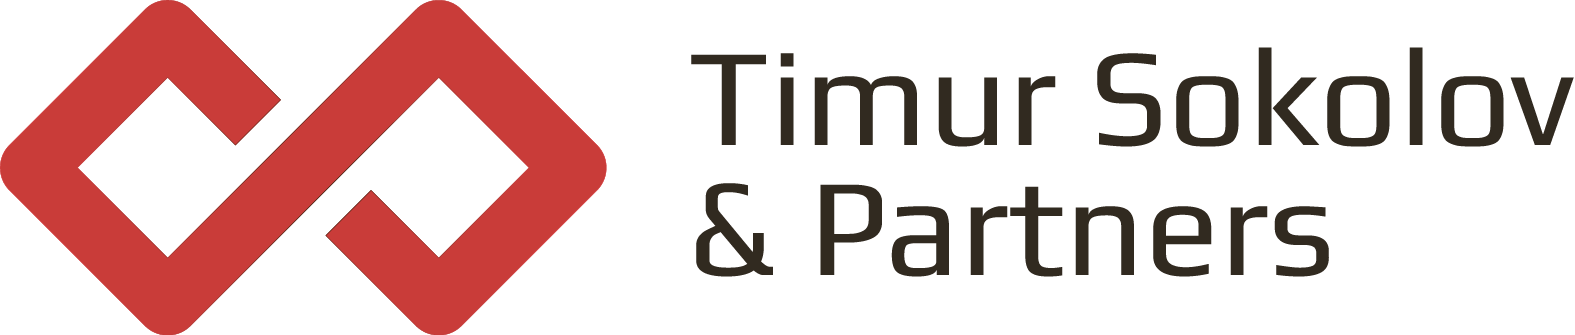 Timur Sokolov & Partners